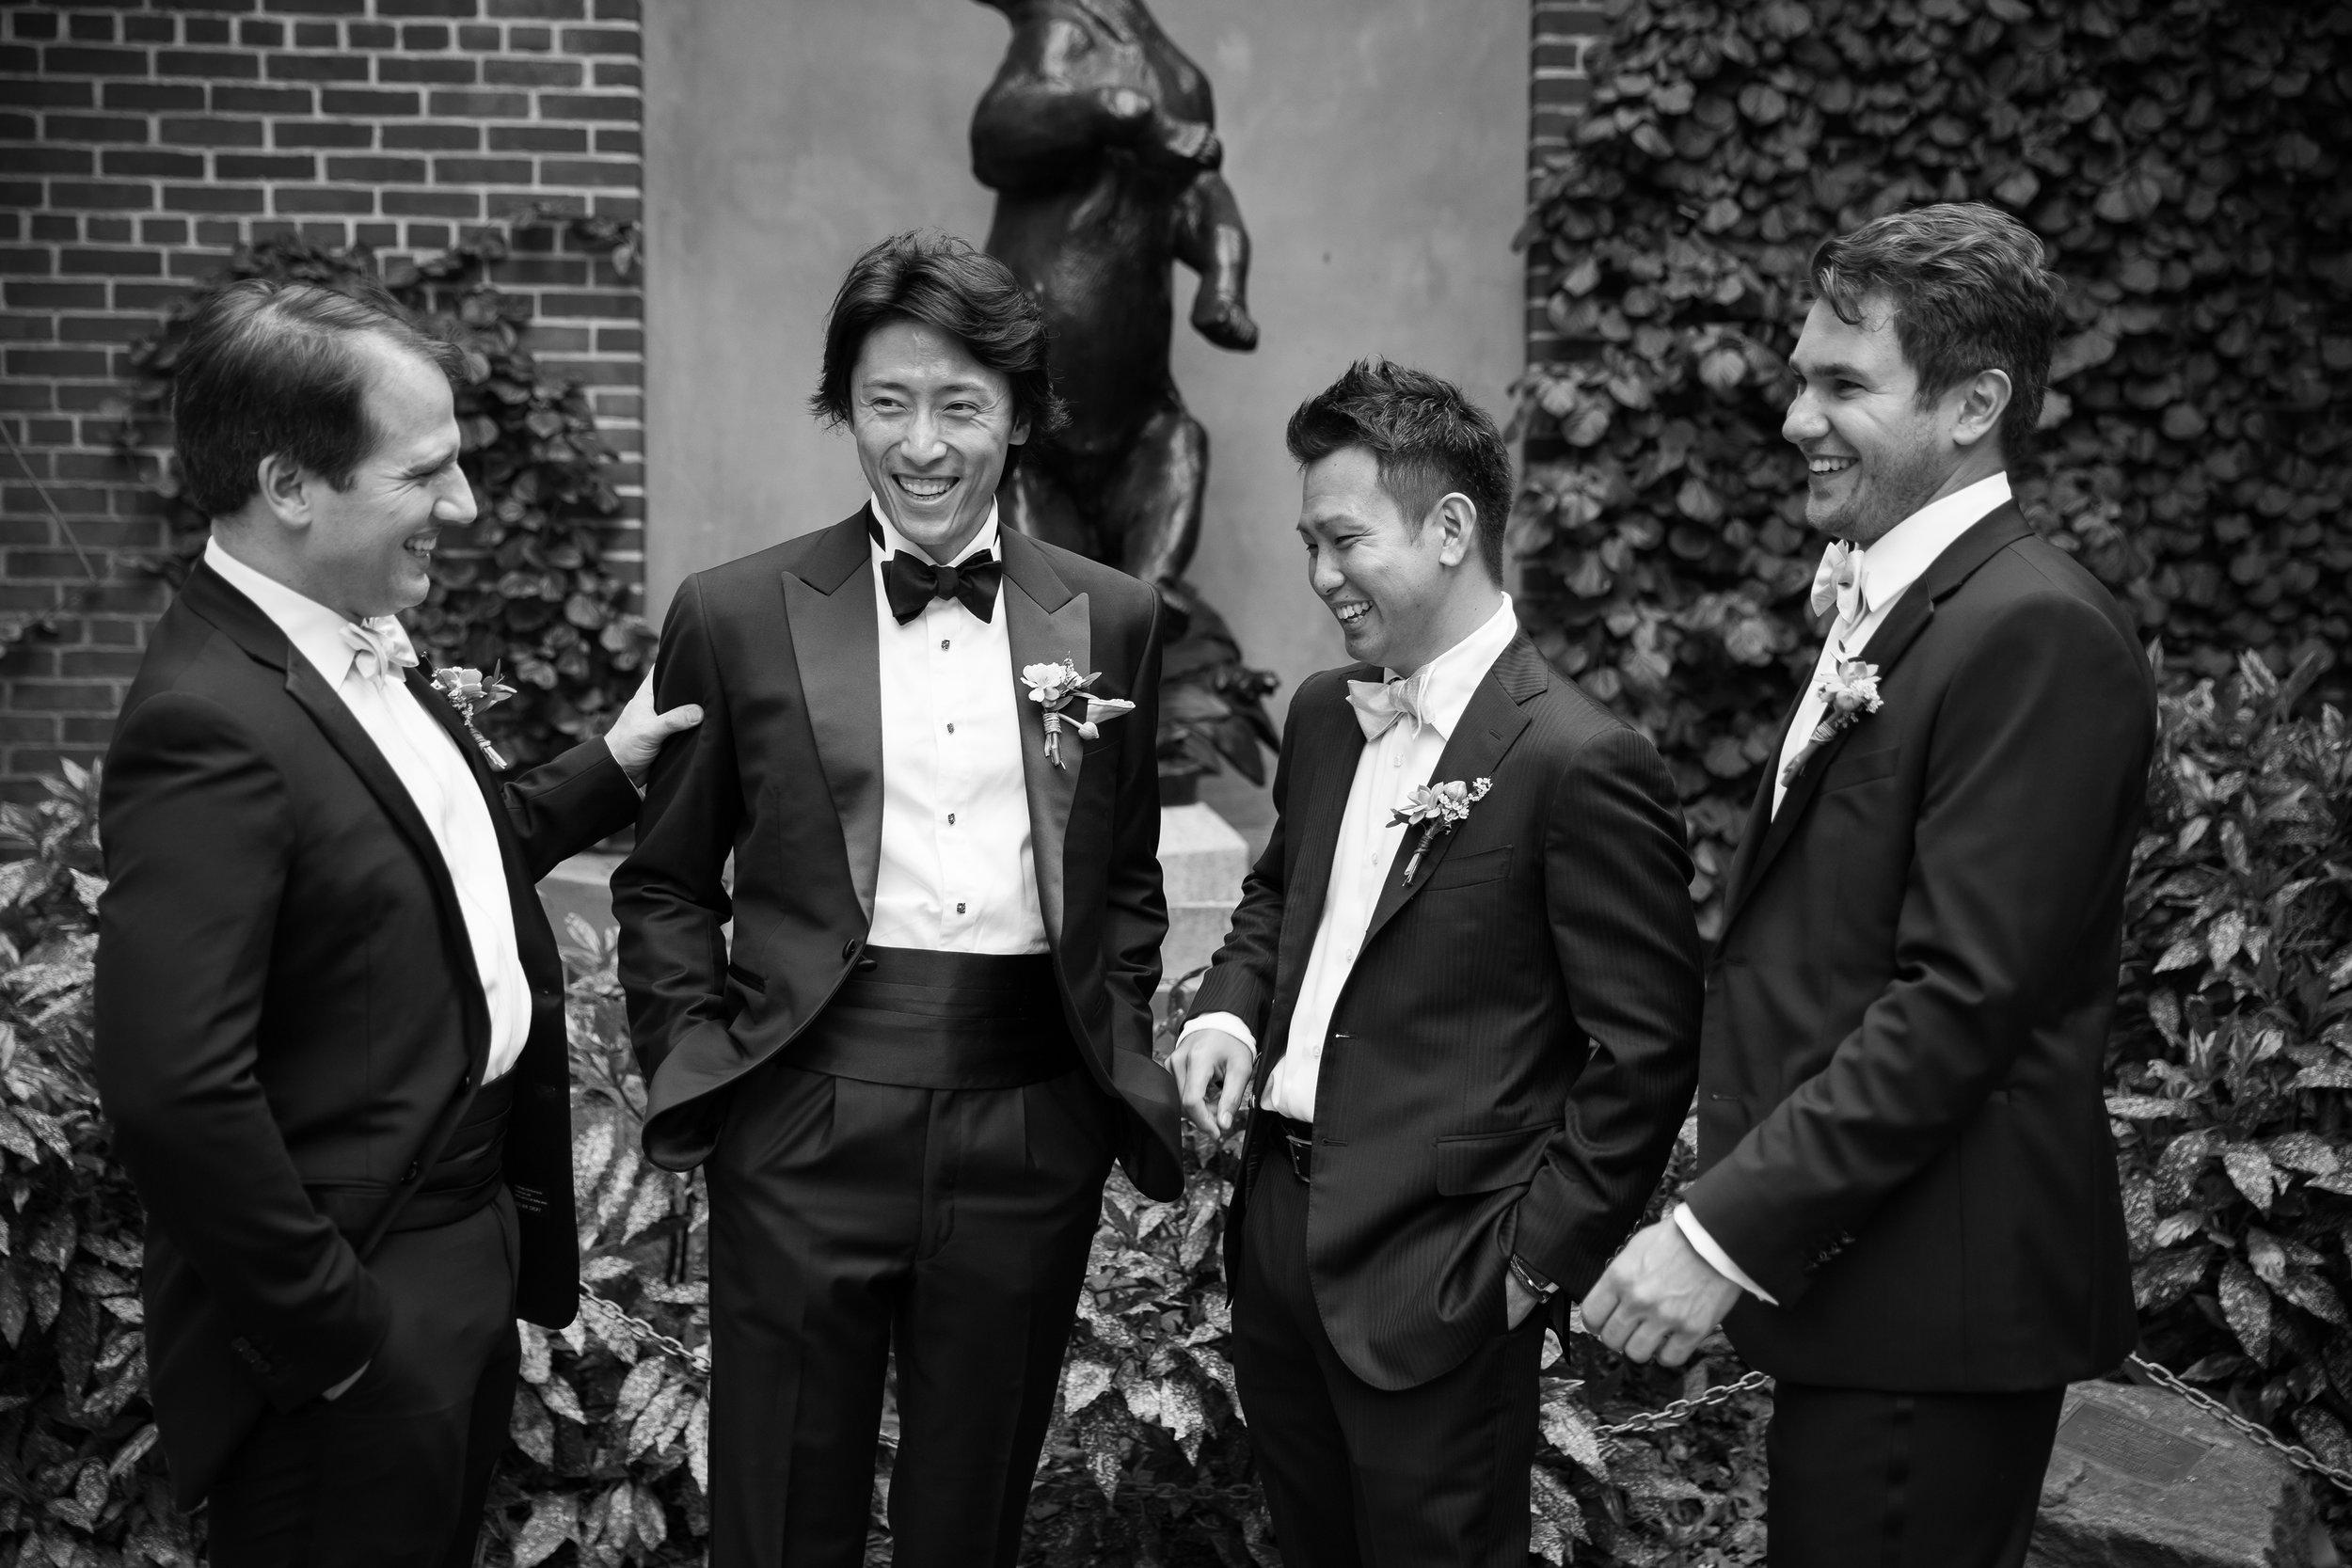 victorious-events-nyc-015-colleen-taka-central-park-zoo-wedding-raymond-hamlin.jpg